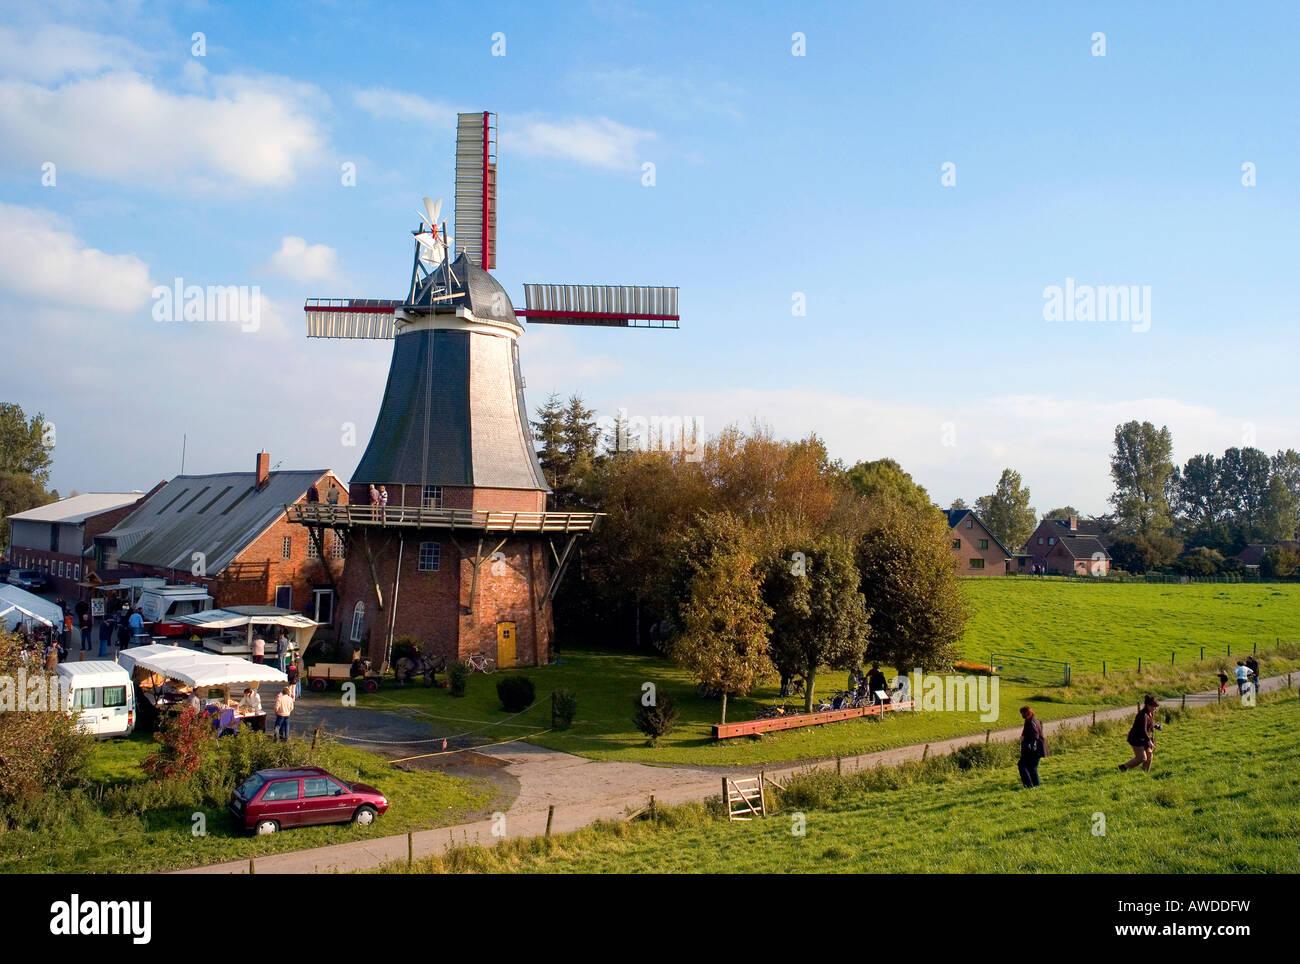 Windmill, Aschwarden, Lower Saxony, Germany - Stock Image